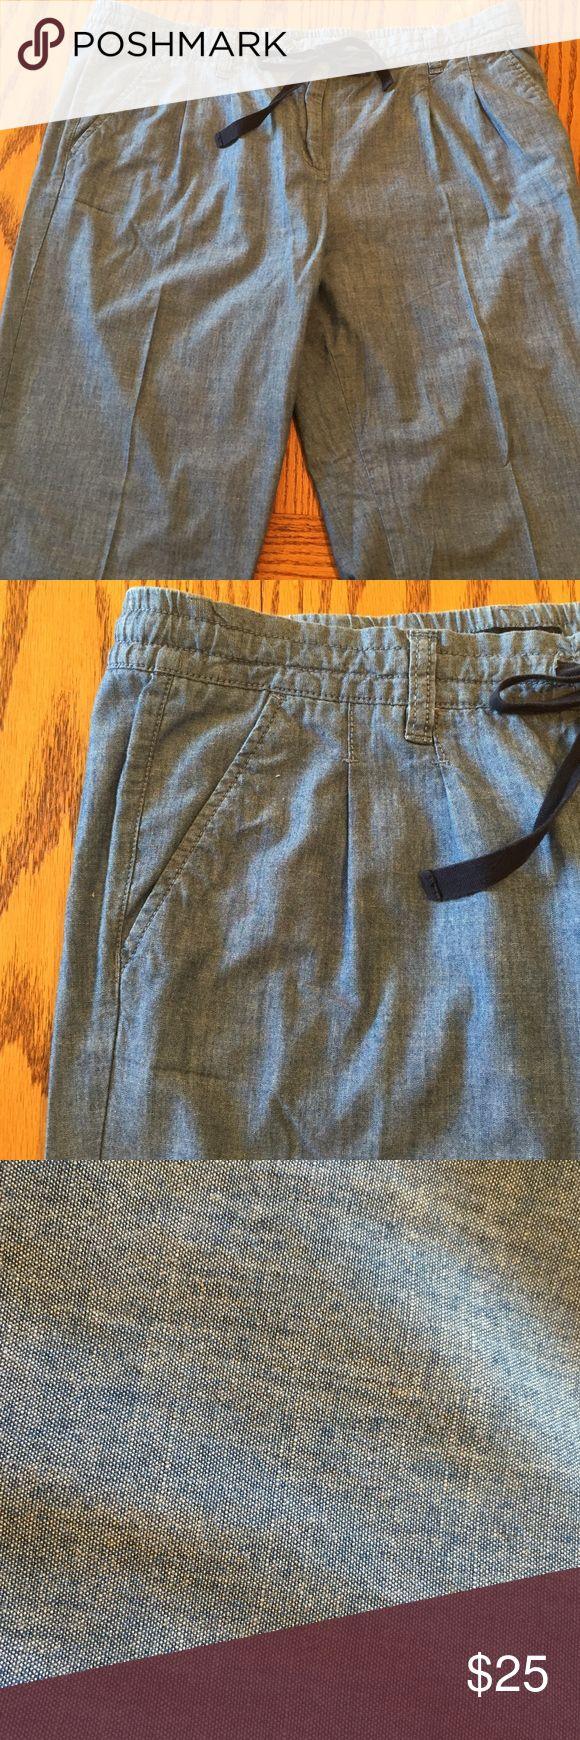 "Tommy Hilfiger blue cotton capris. Size 14 Like new Tommy Hilfiger chambray drawstring capris. Size 14. 24"" inseam 11"" rise. 100"" cotton Tommy Hilfiger Pants Capris"